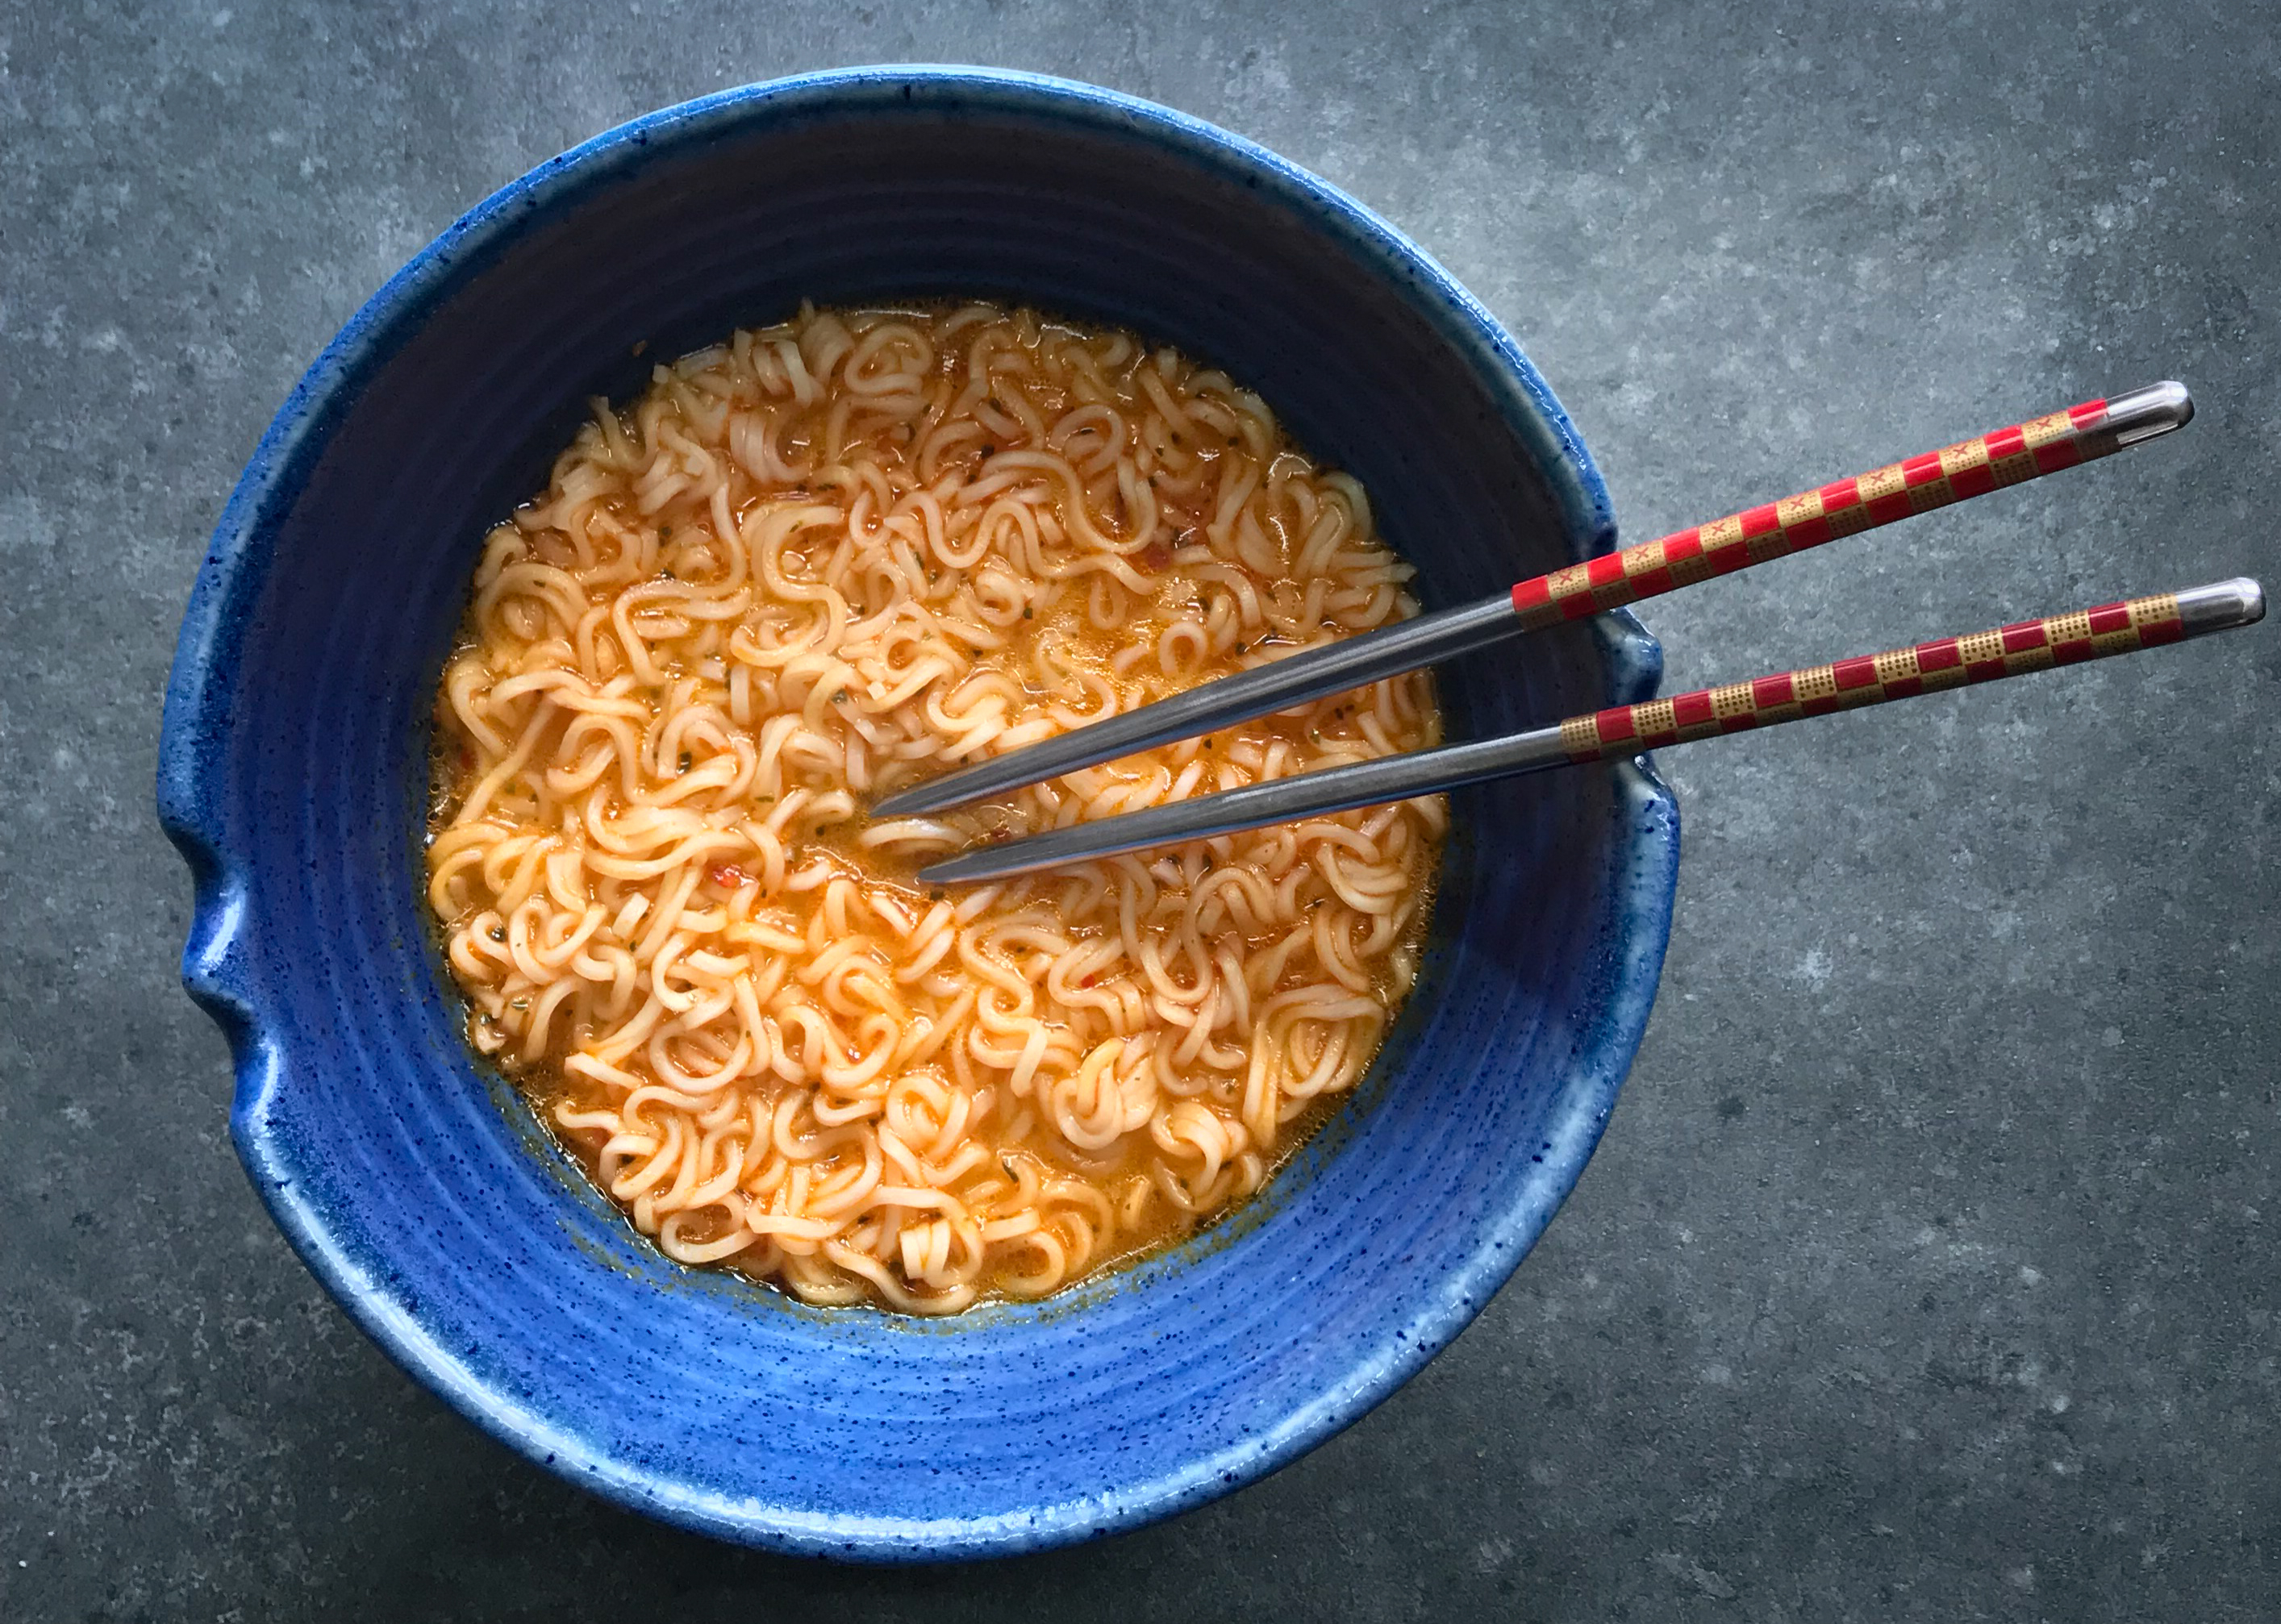 67. KOKA Tom Yum Flavor Instant Noodles